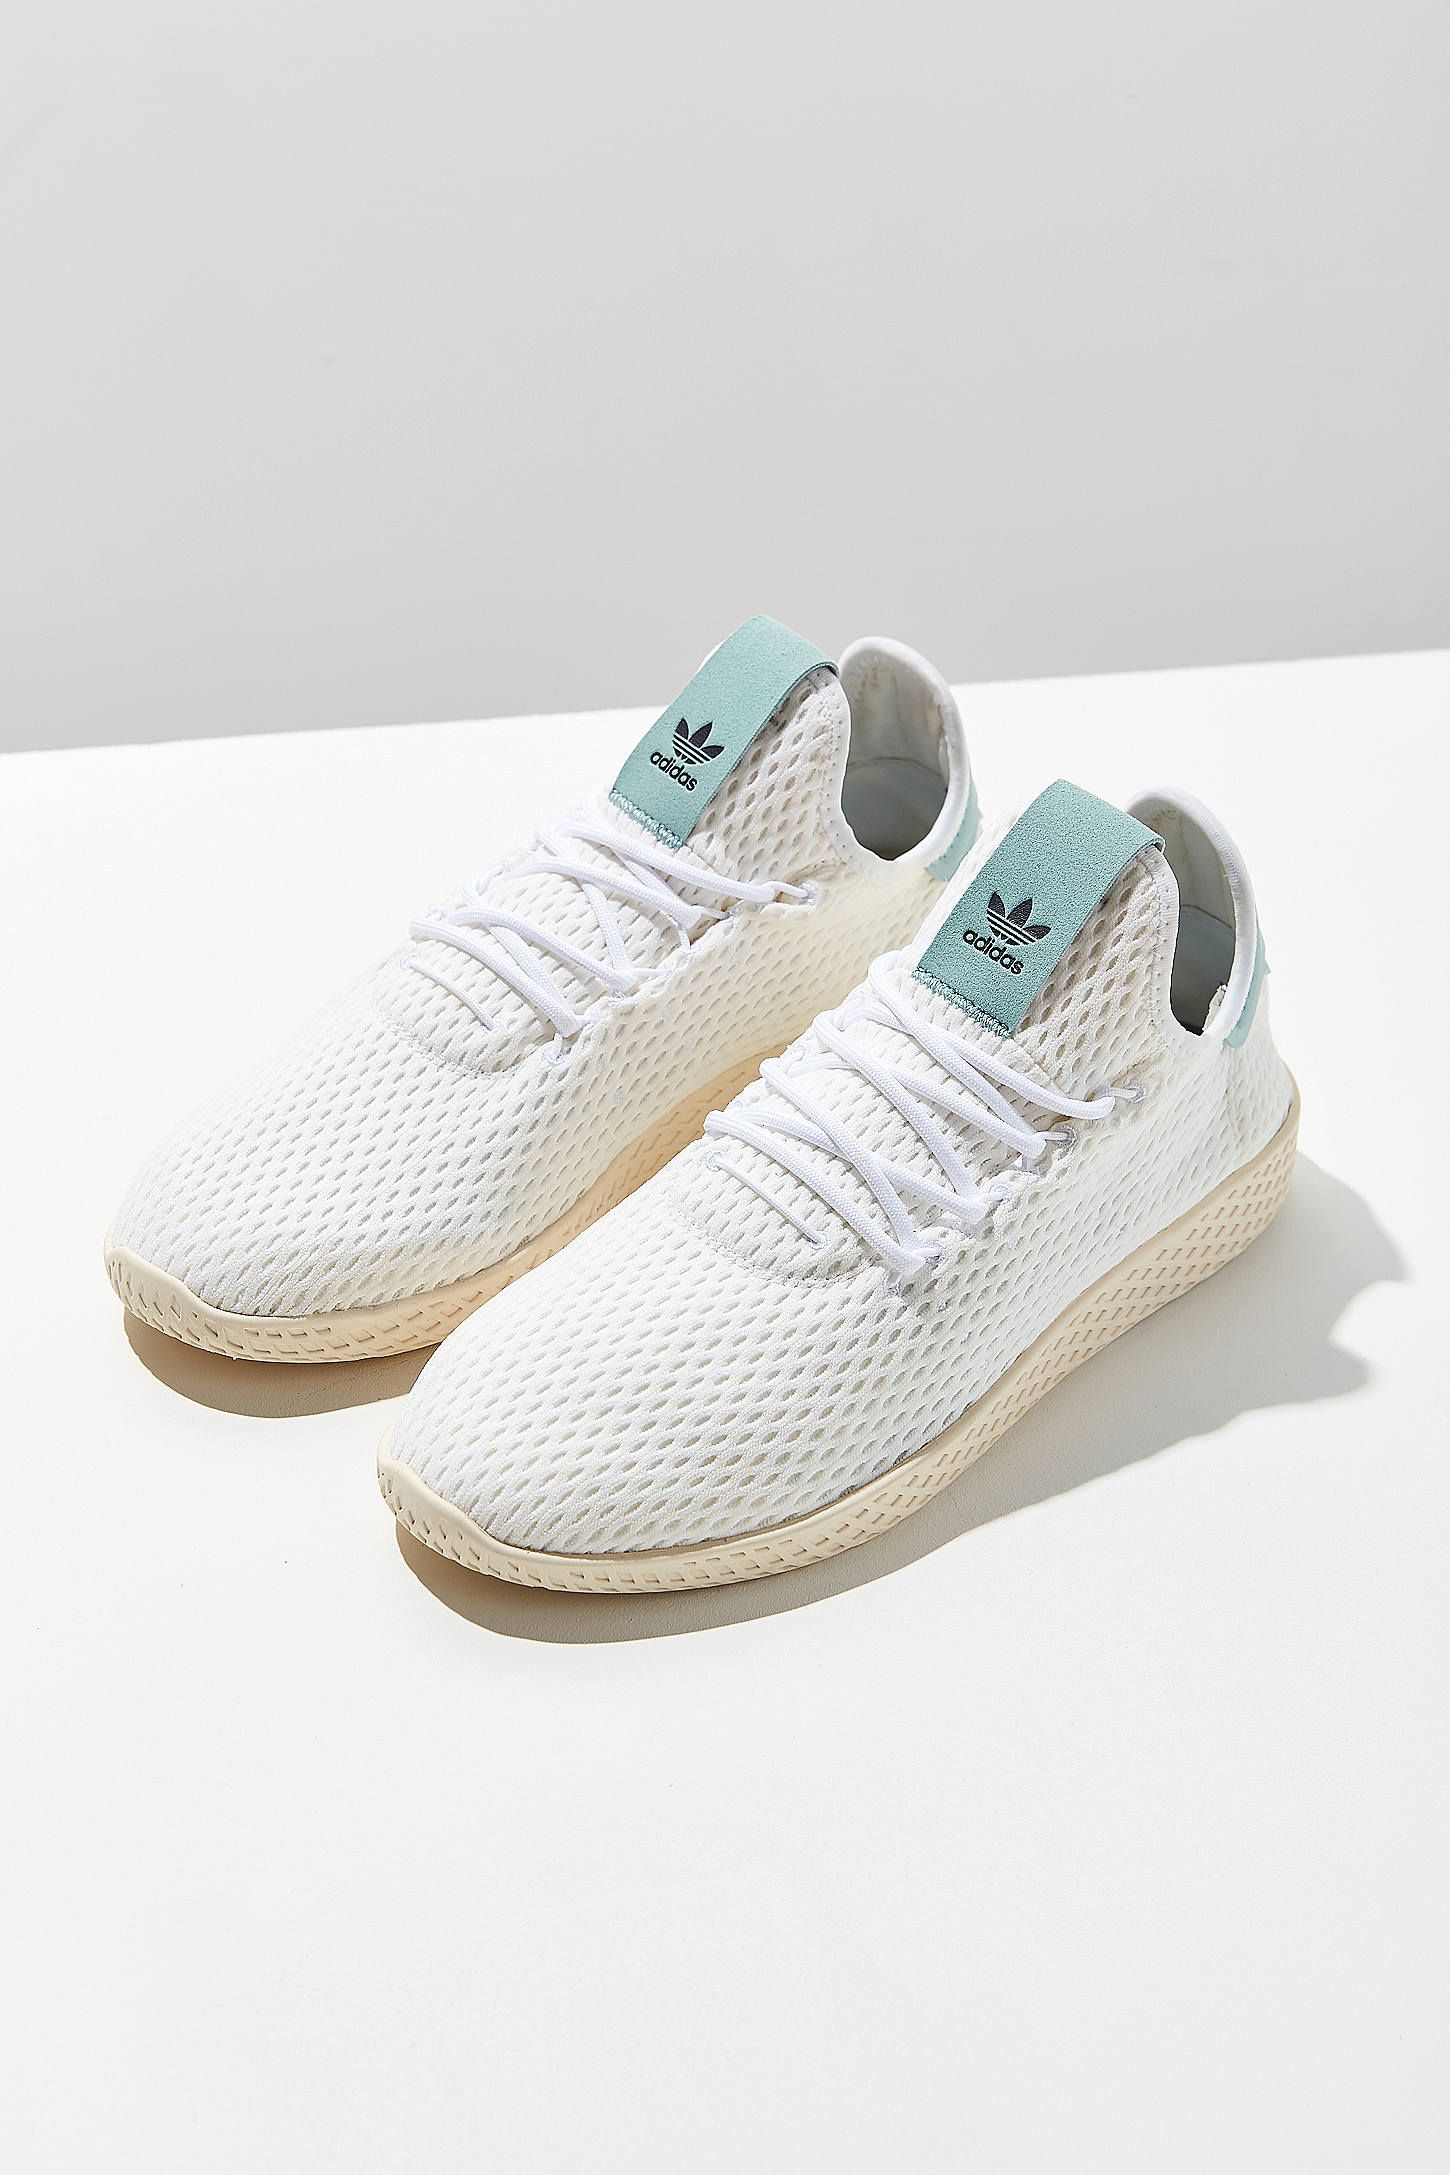 Adidas Originals X Pharrell Williams Tennis Hu Sneaker Adidas Pharrell Williams Sneakers Williams Tennis